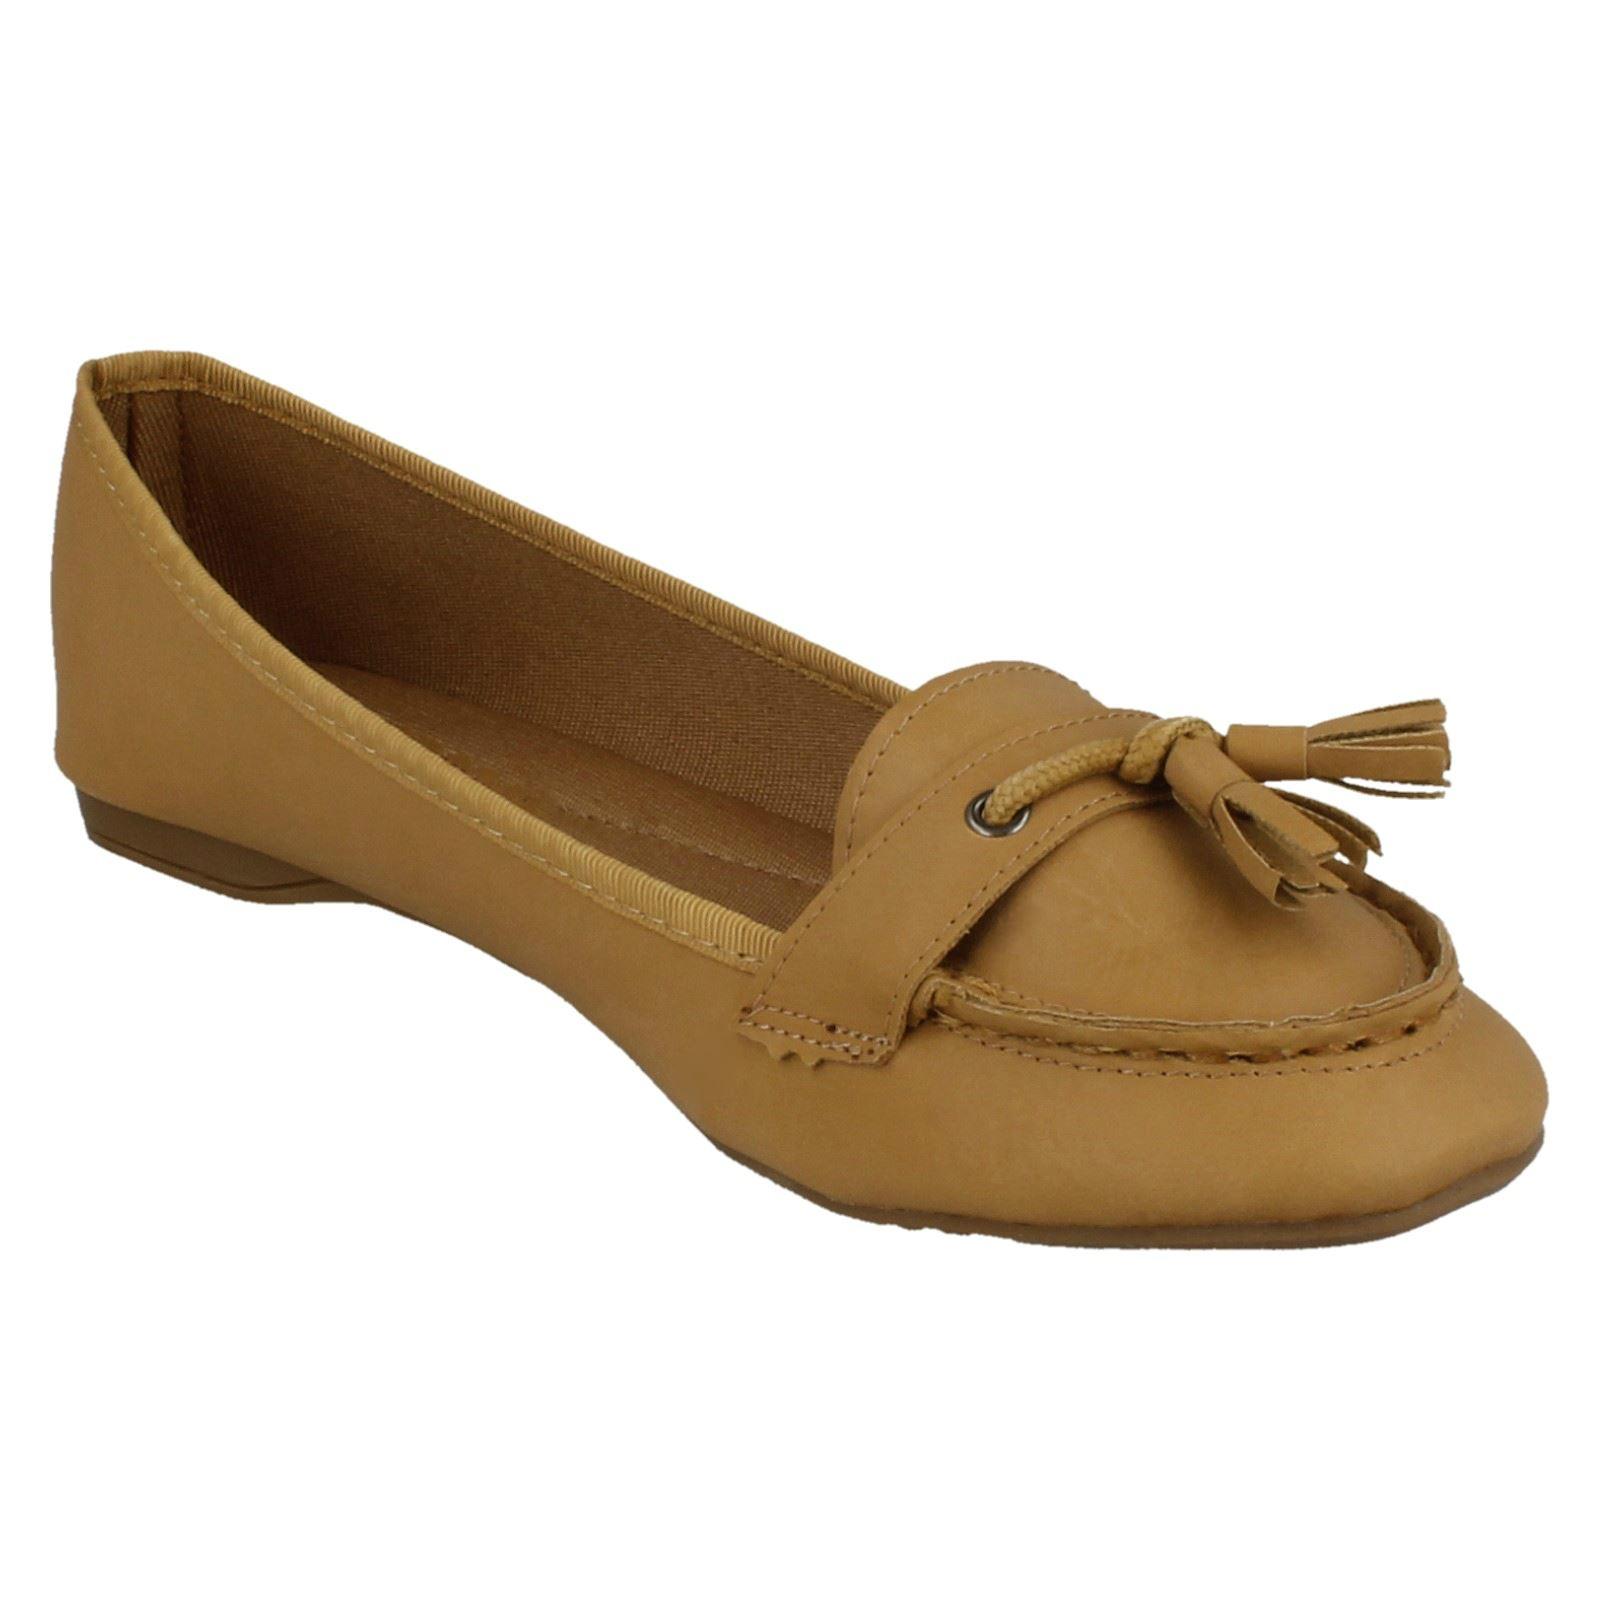 Spot on Damas Zapatos Planos Tassle Trim